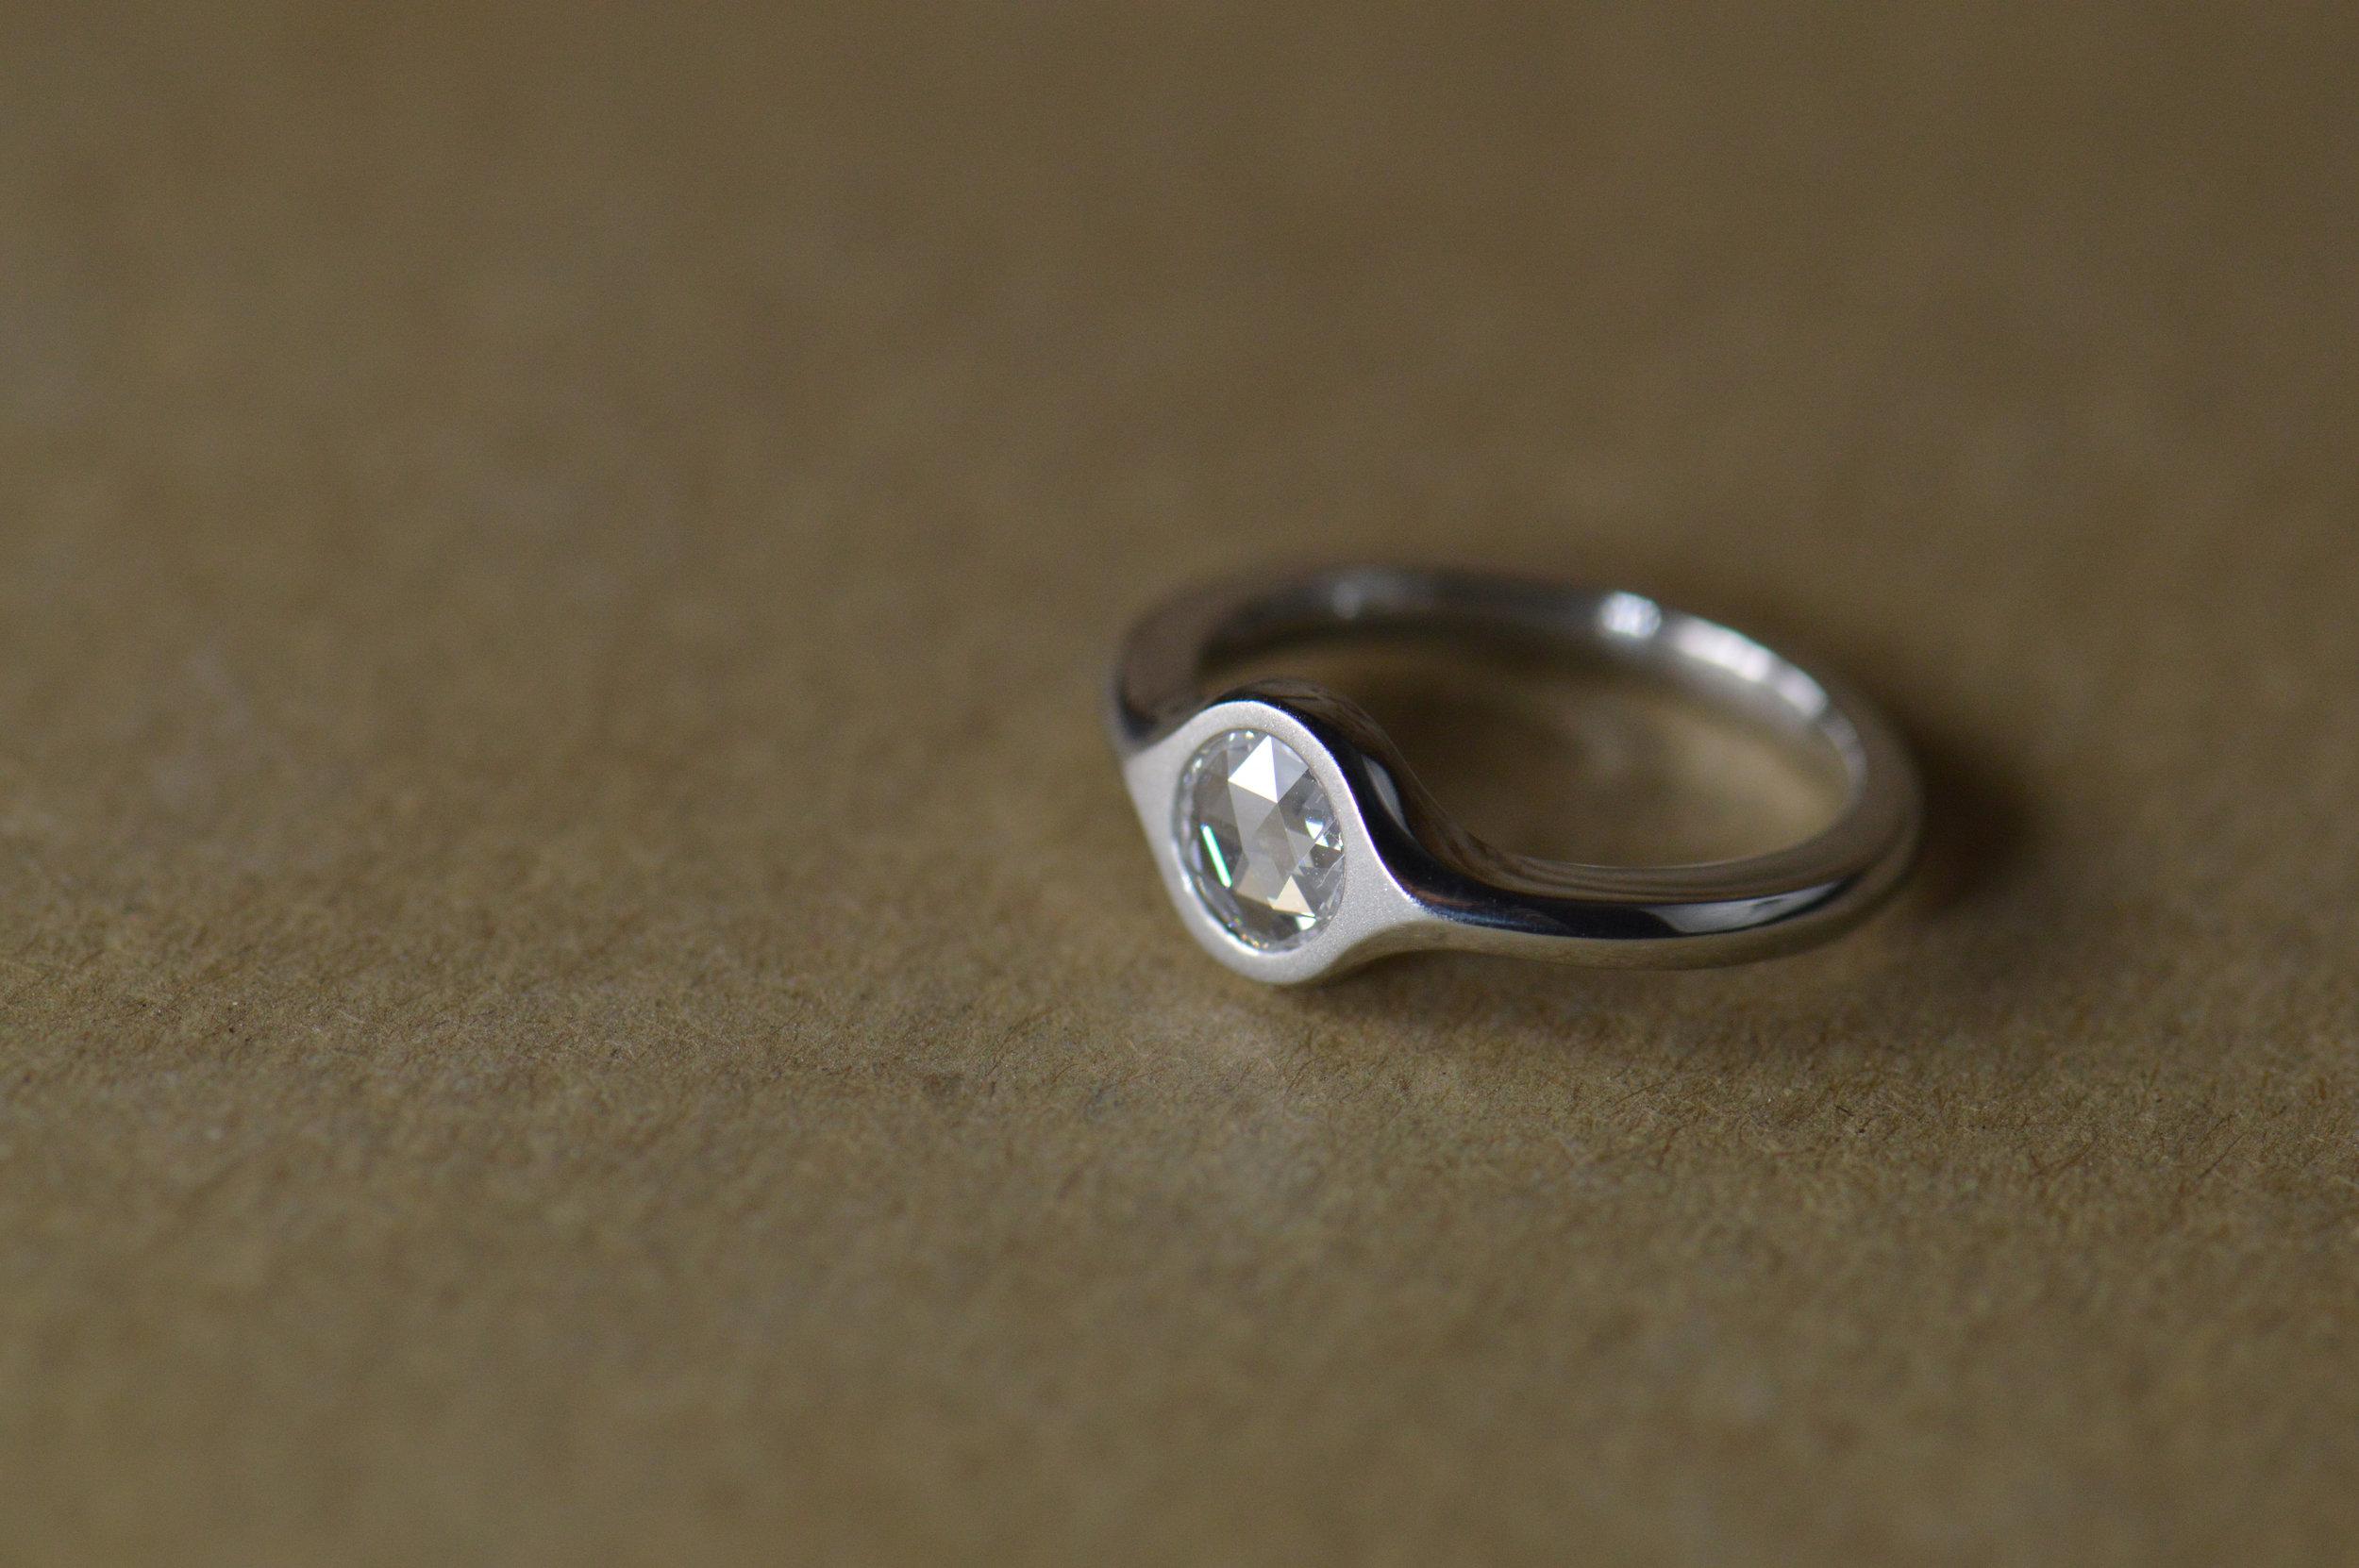 darvier-client-designed-platinum-rose-cut-diamond-engagement-ring.jpg